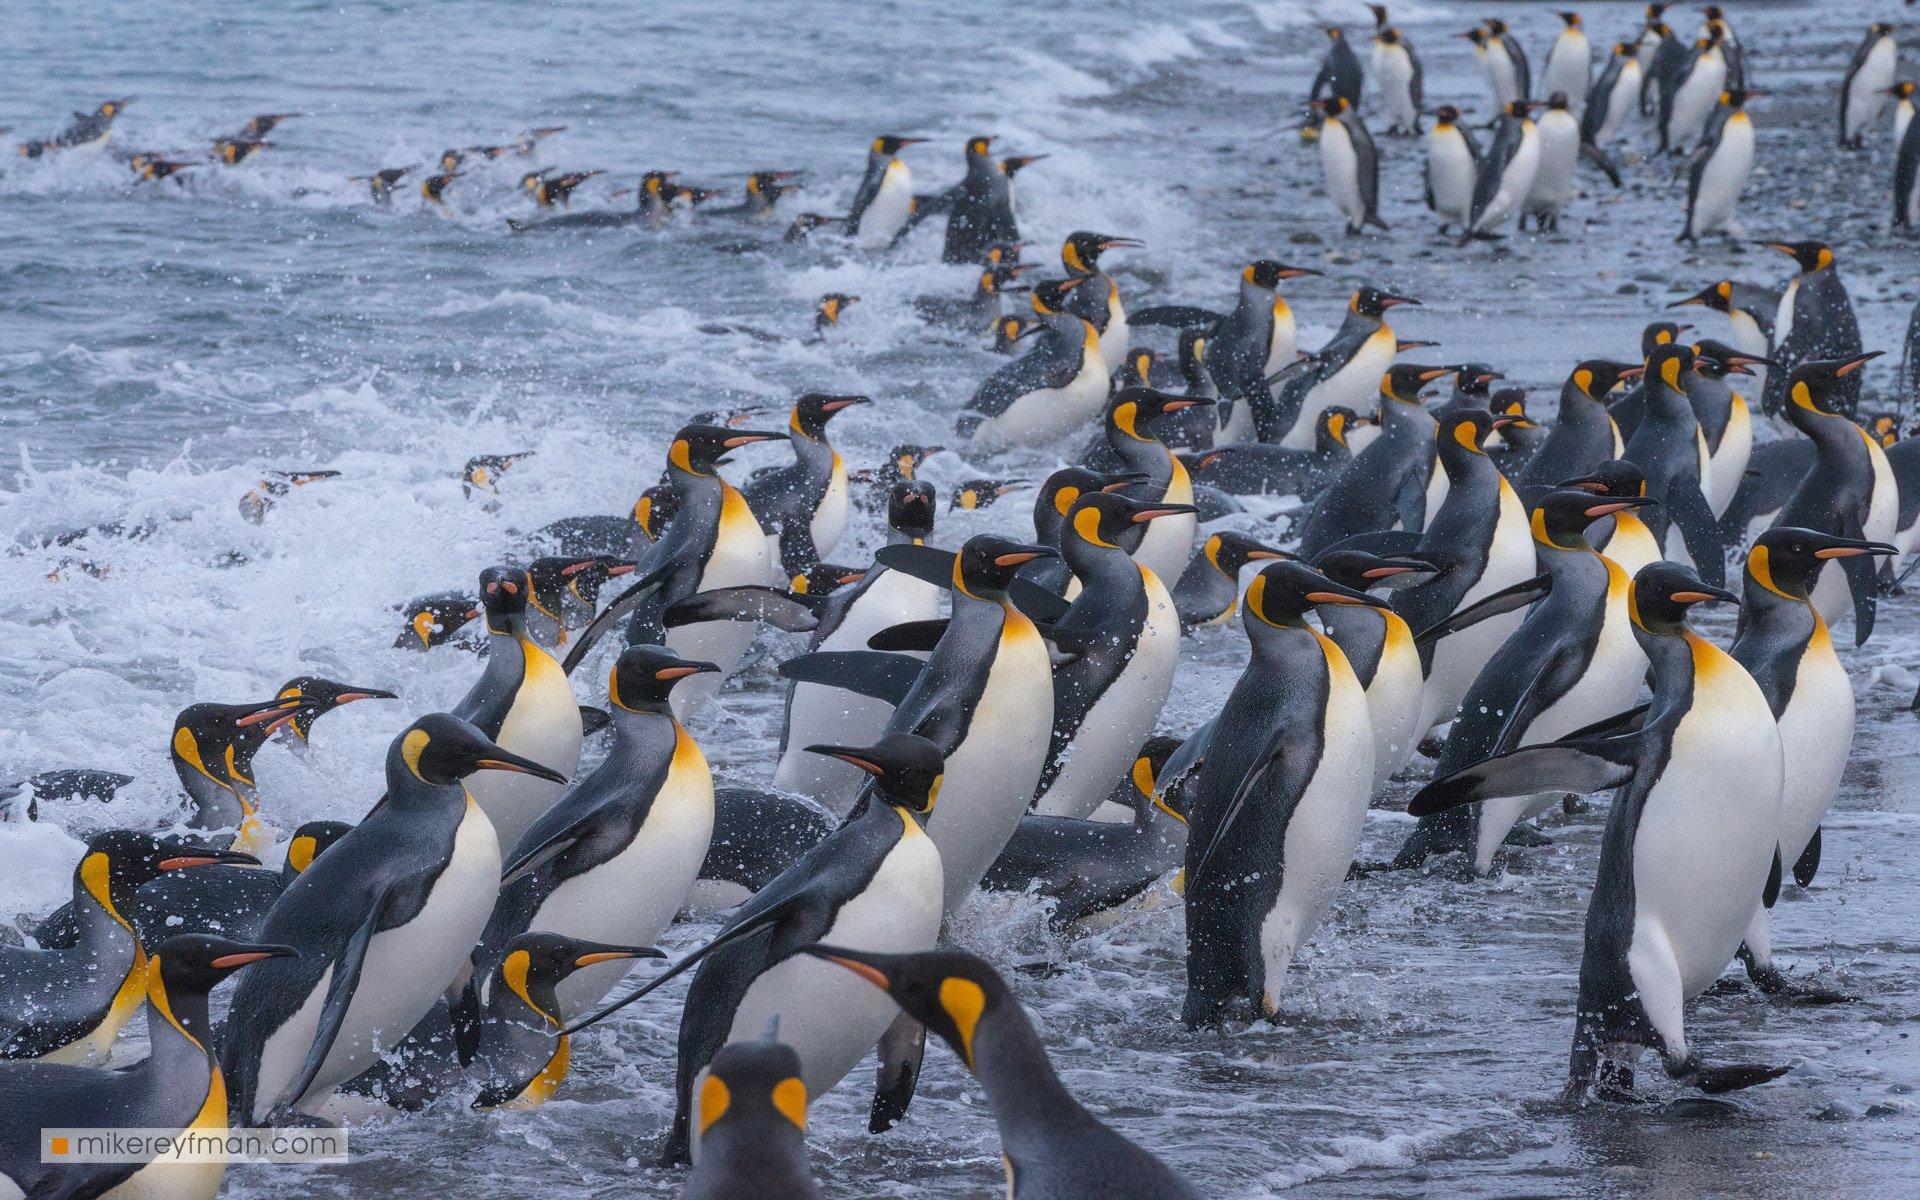 южная джорджия, south georgia, antarctica, king penguin, penguin, salisbury plain, south atlantic, Майк Рейфман